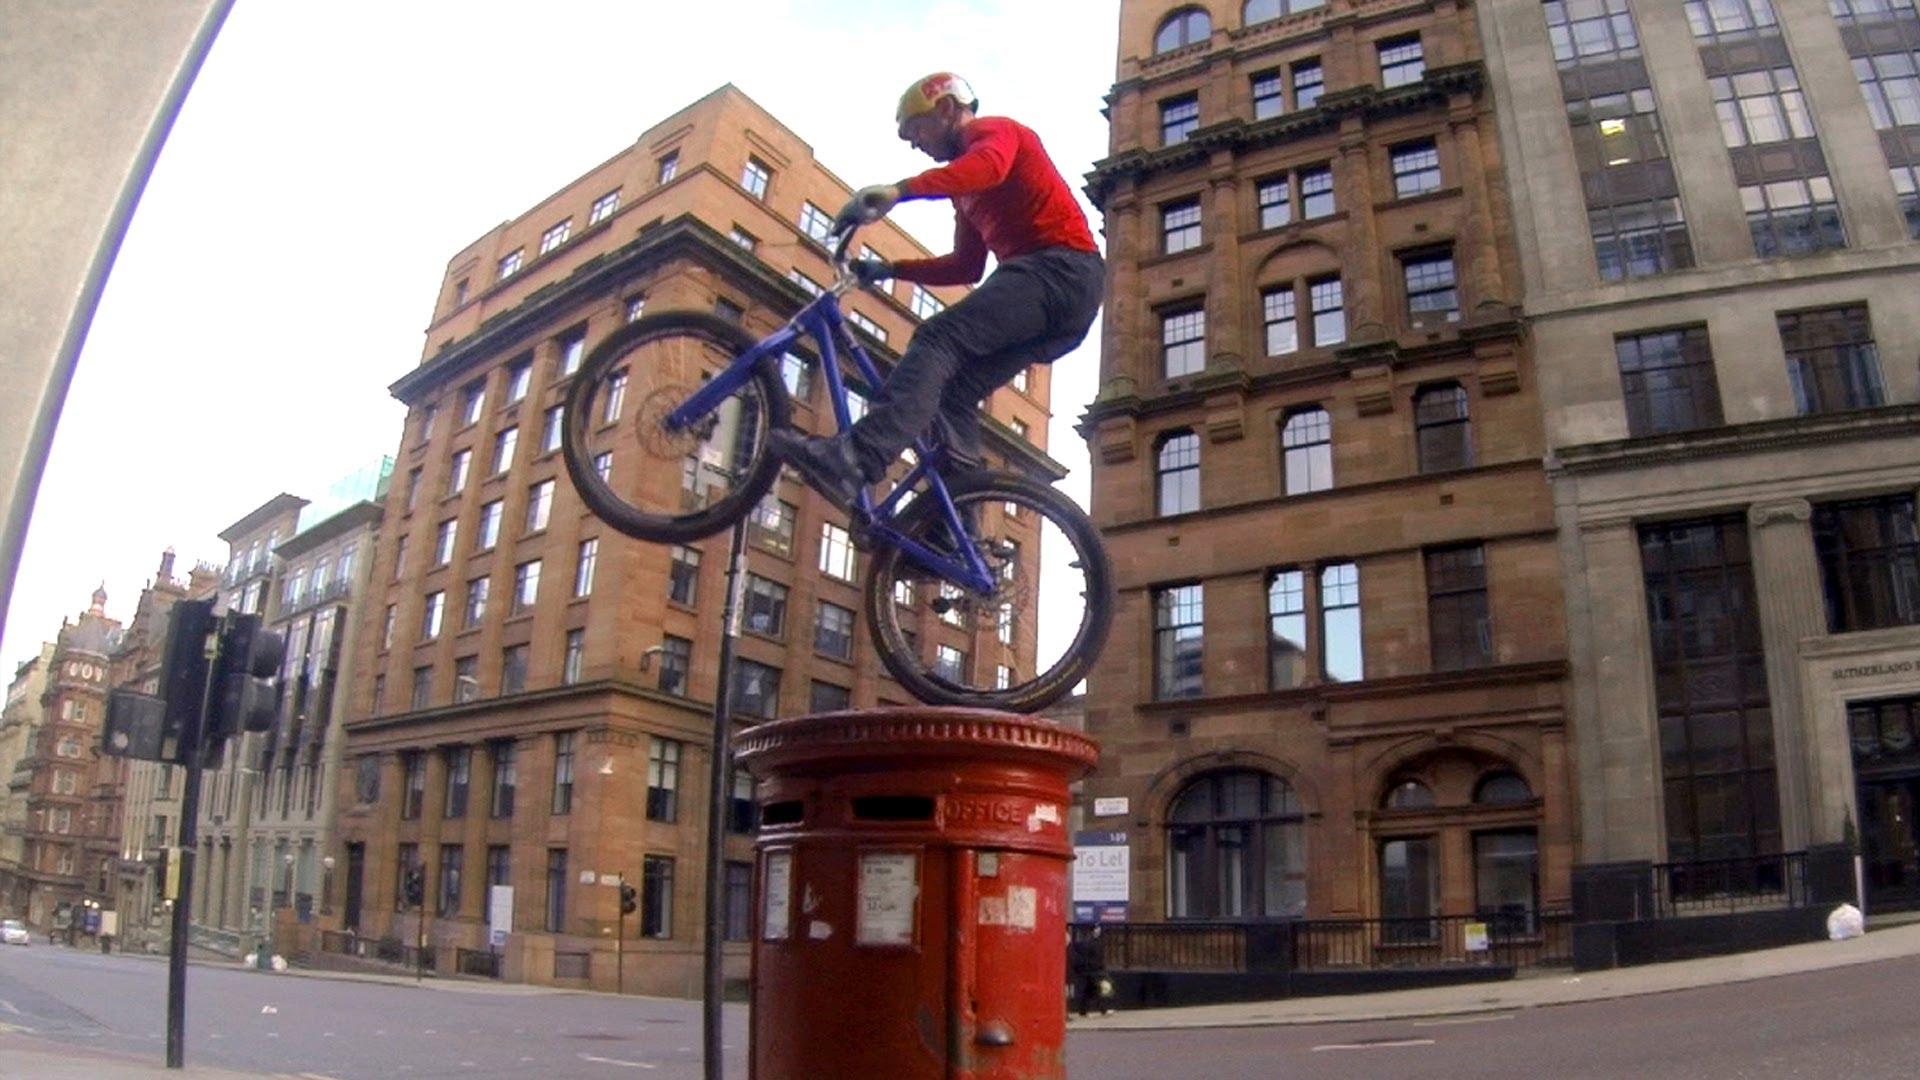 GoPro: Danny MacAskill Sunday Ride